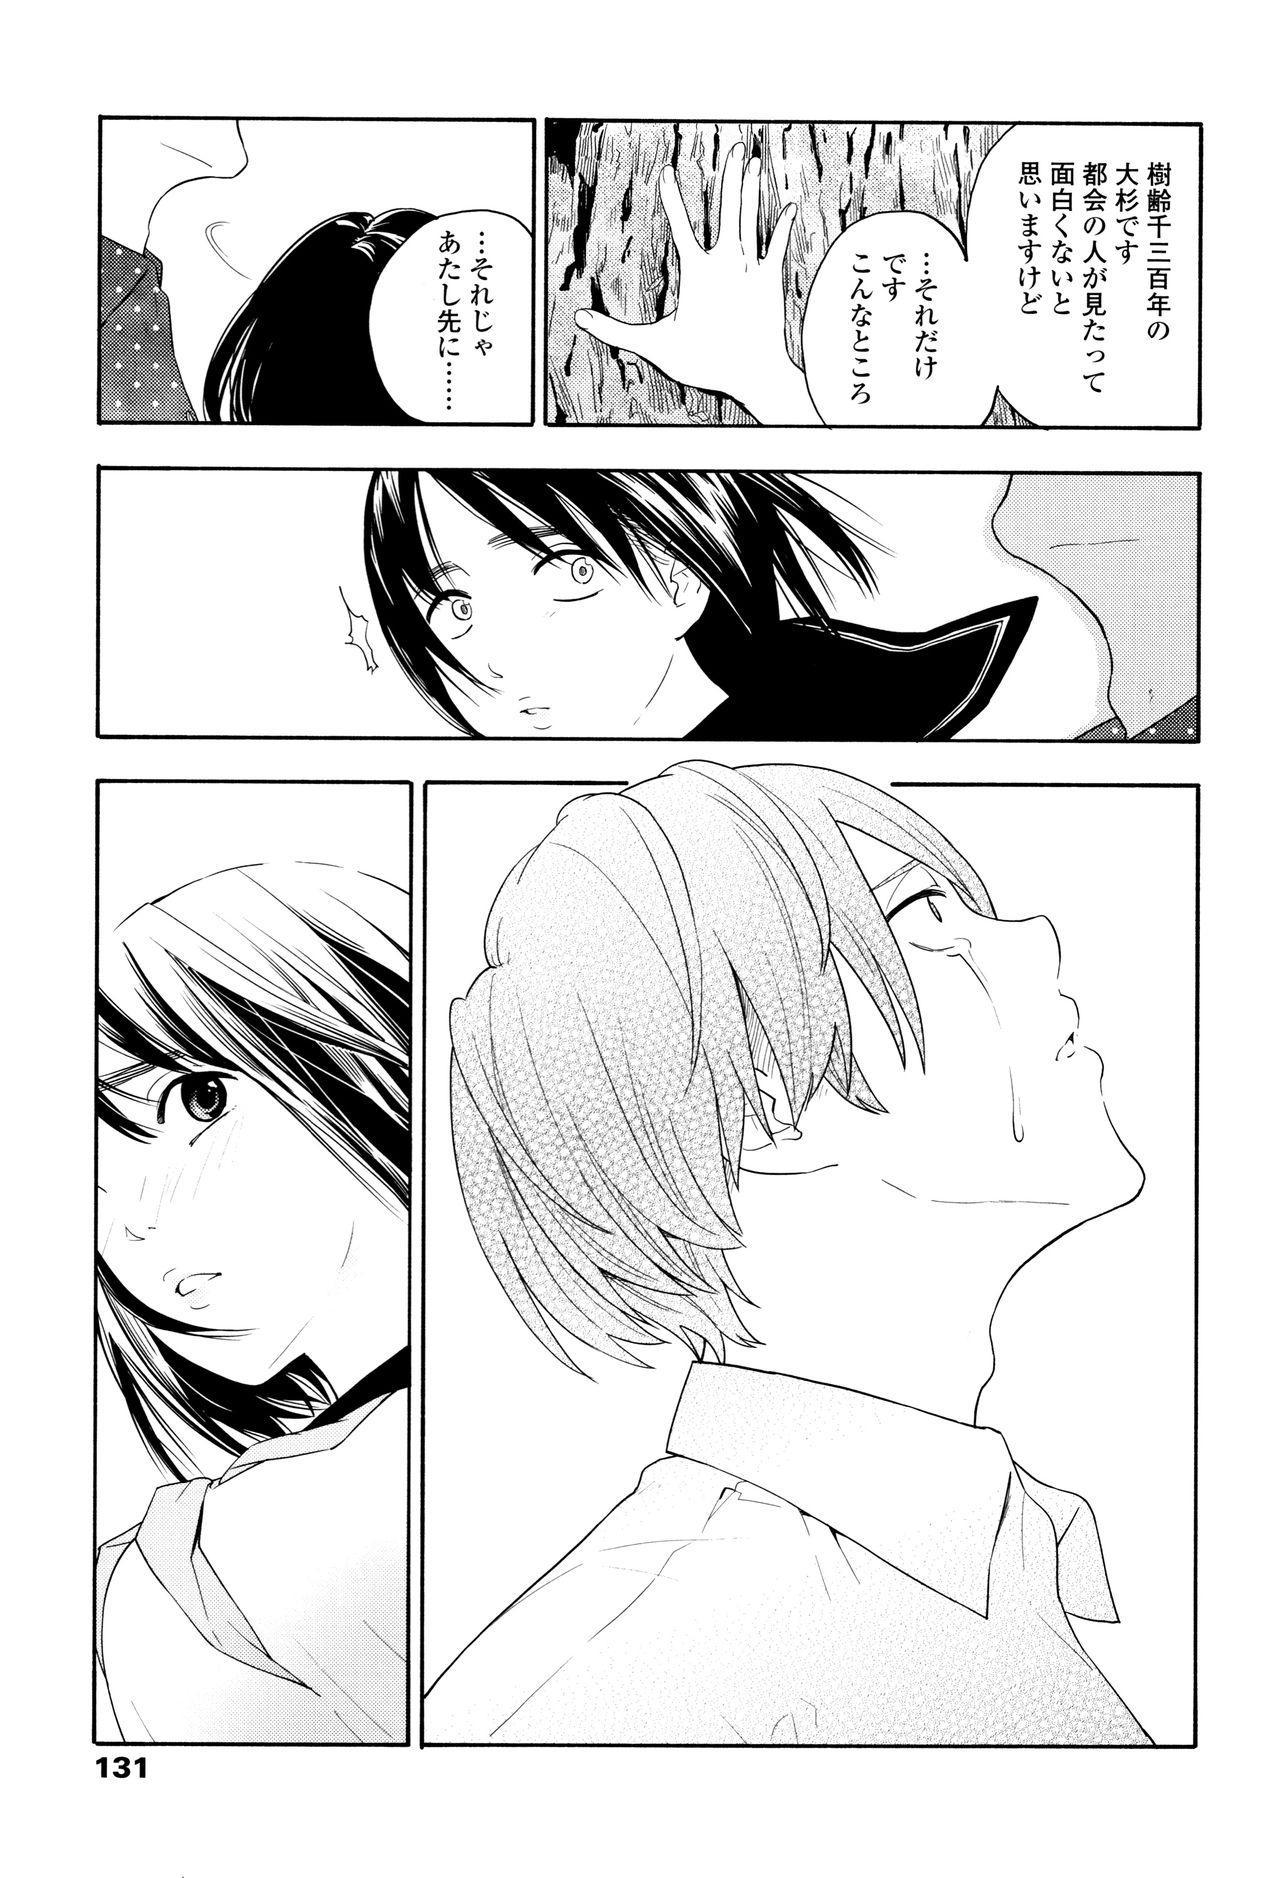 Shishunki no Eros - puberty eros 133